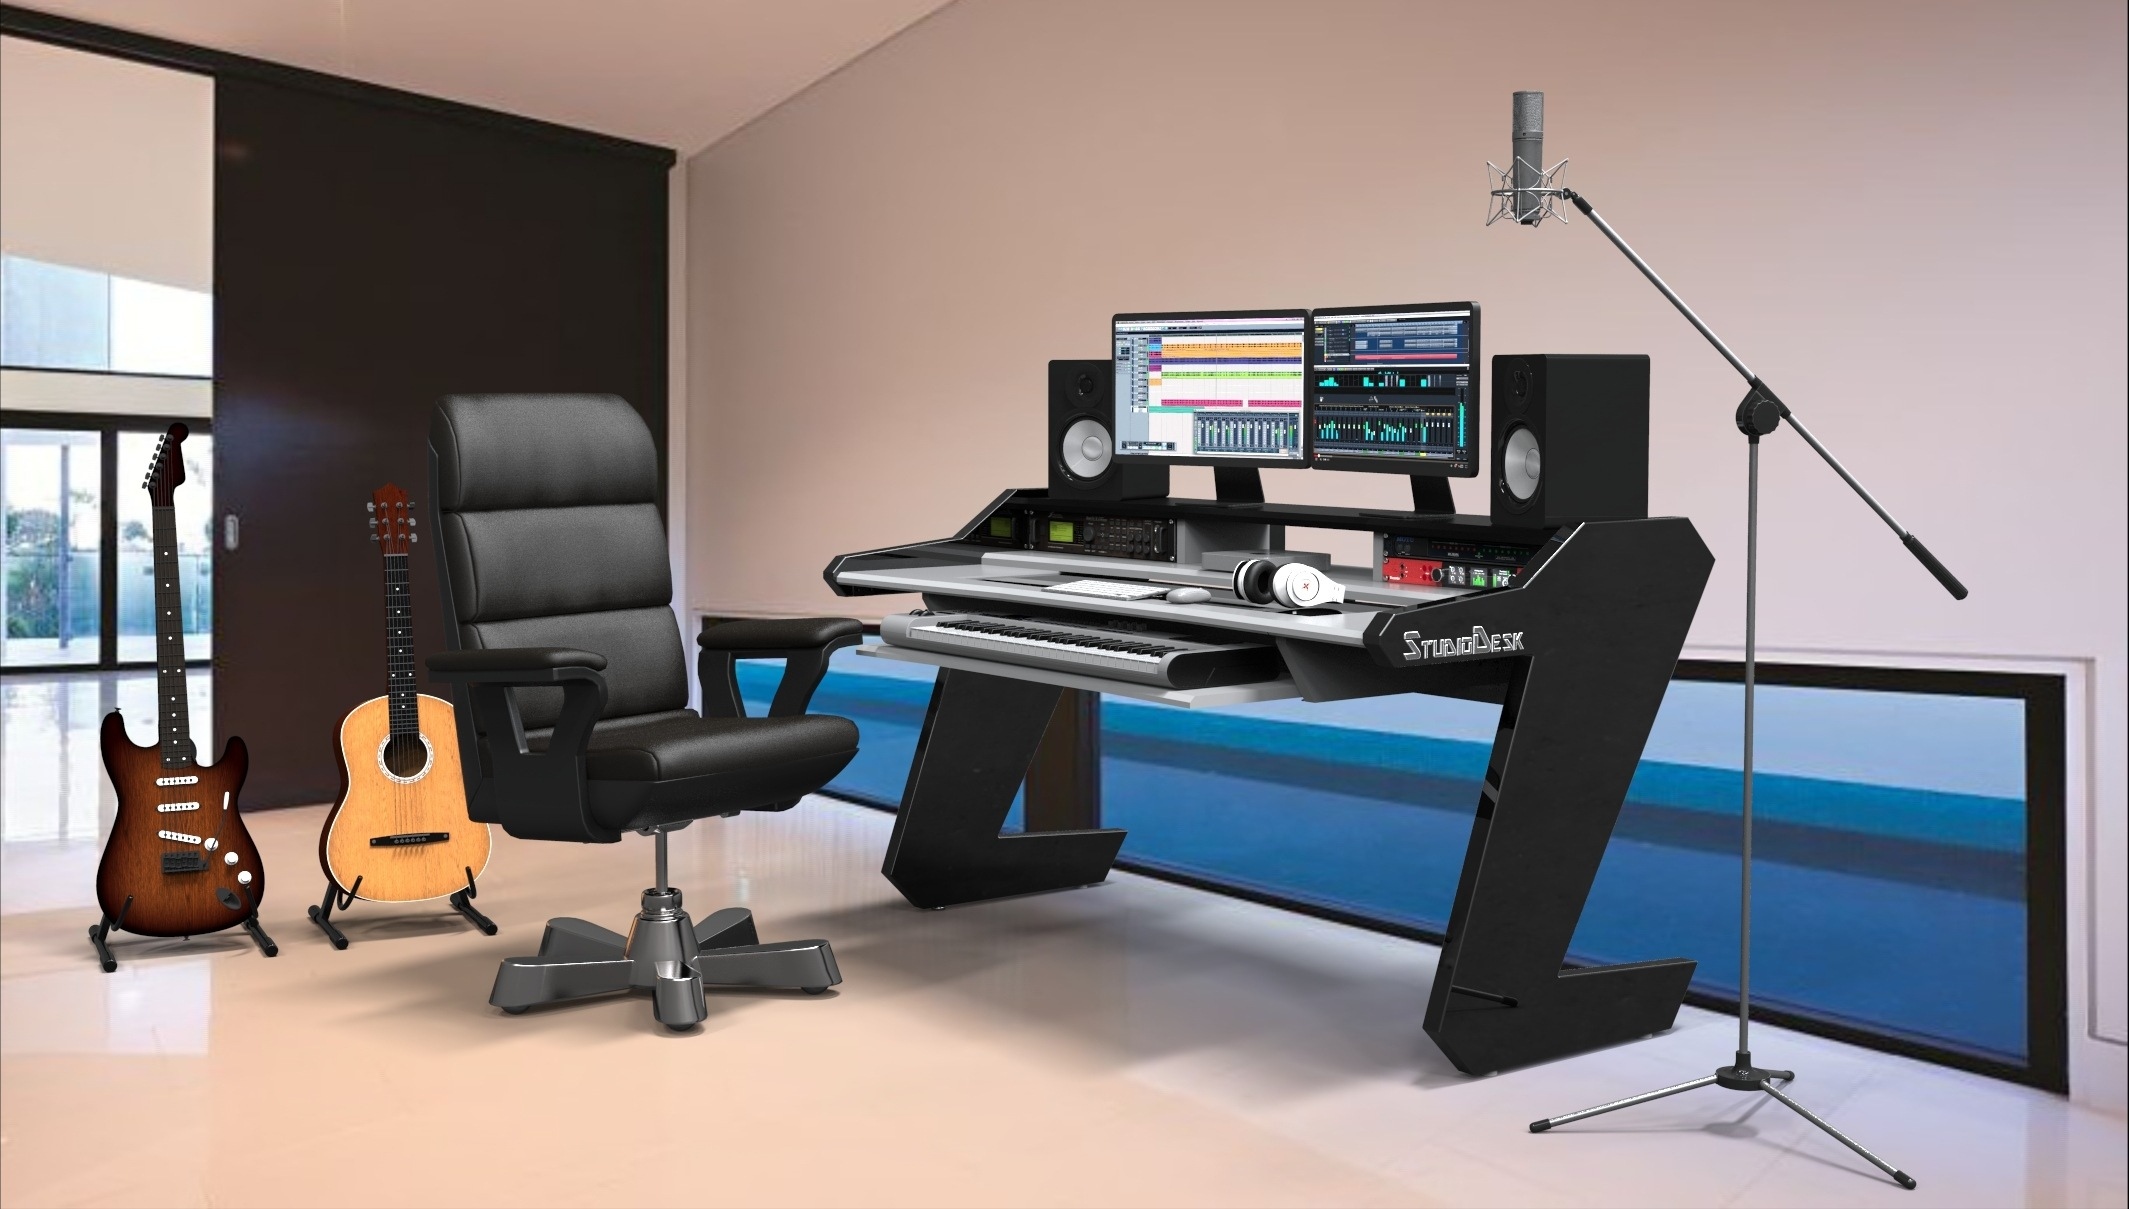 Music Studio Desks  The Desk you deserve StudioDesk